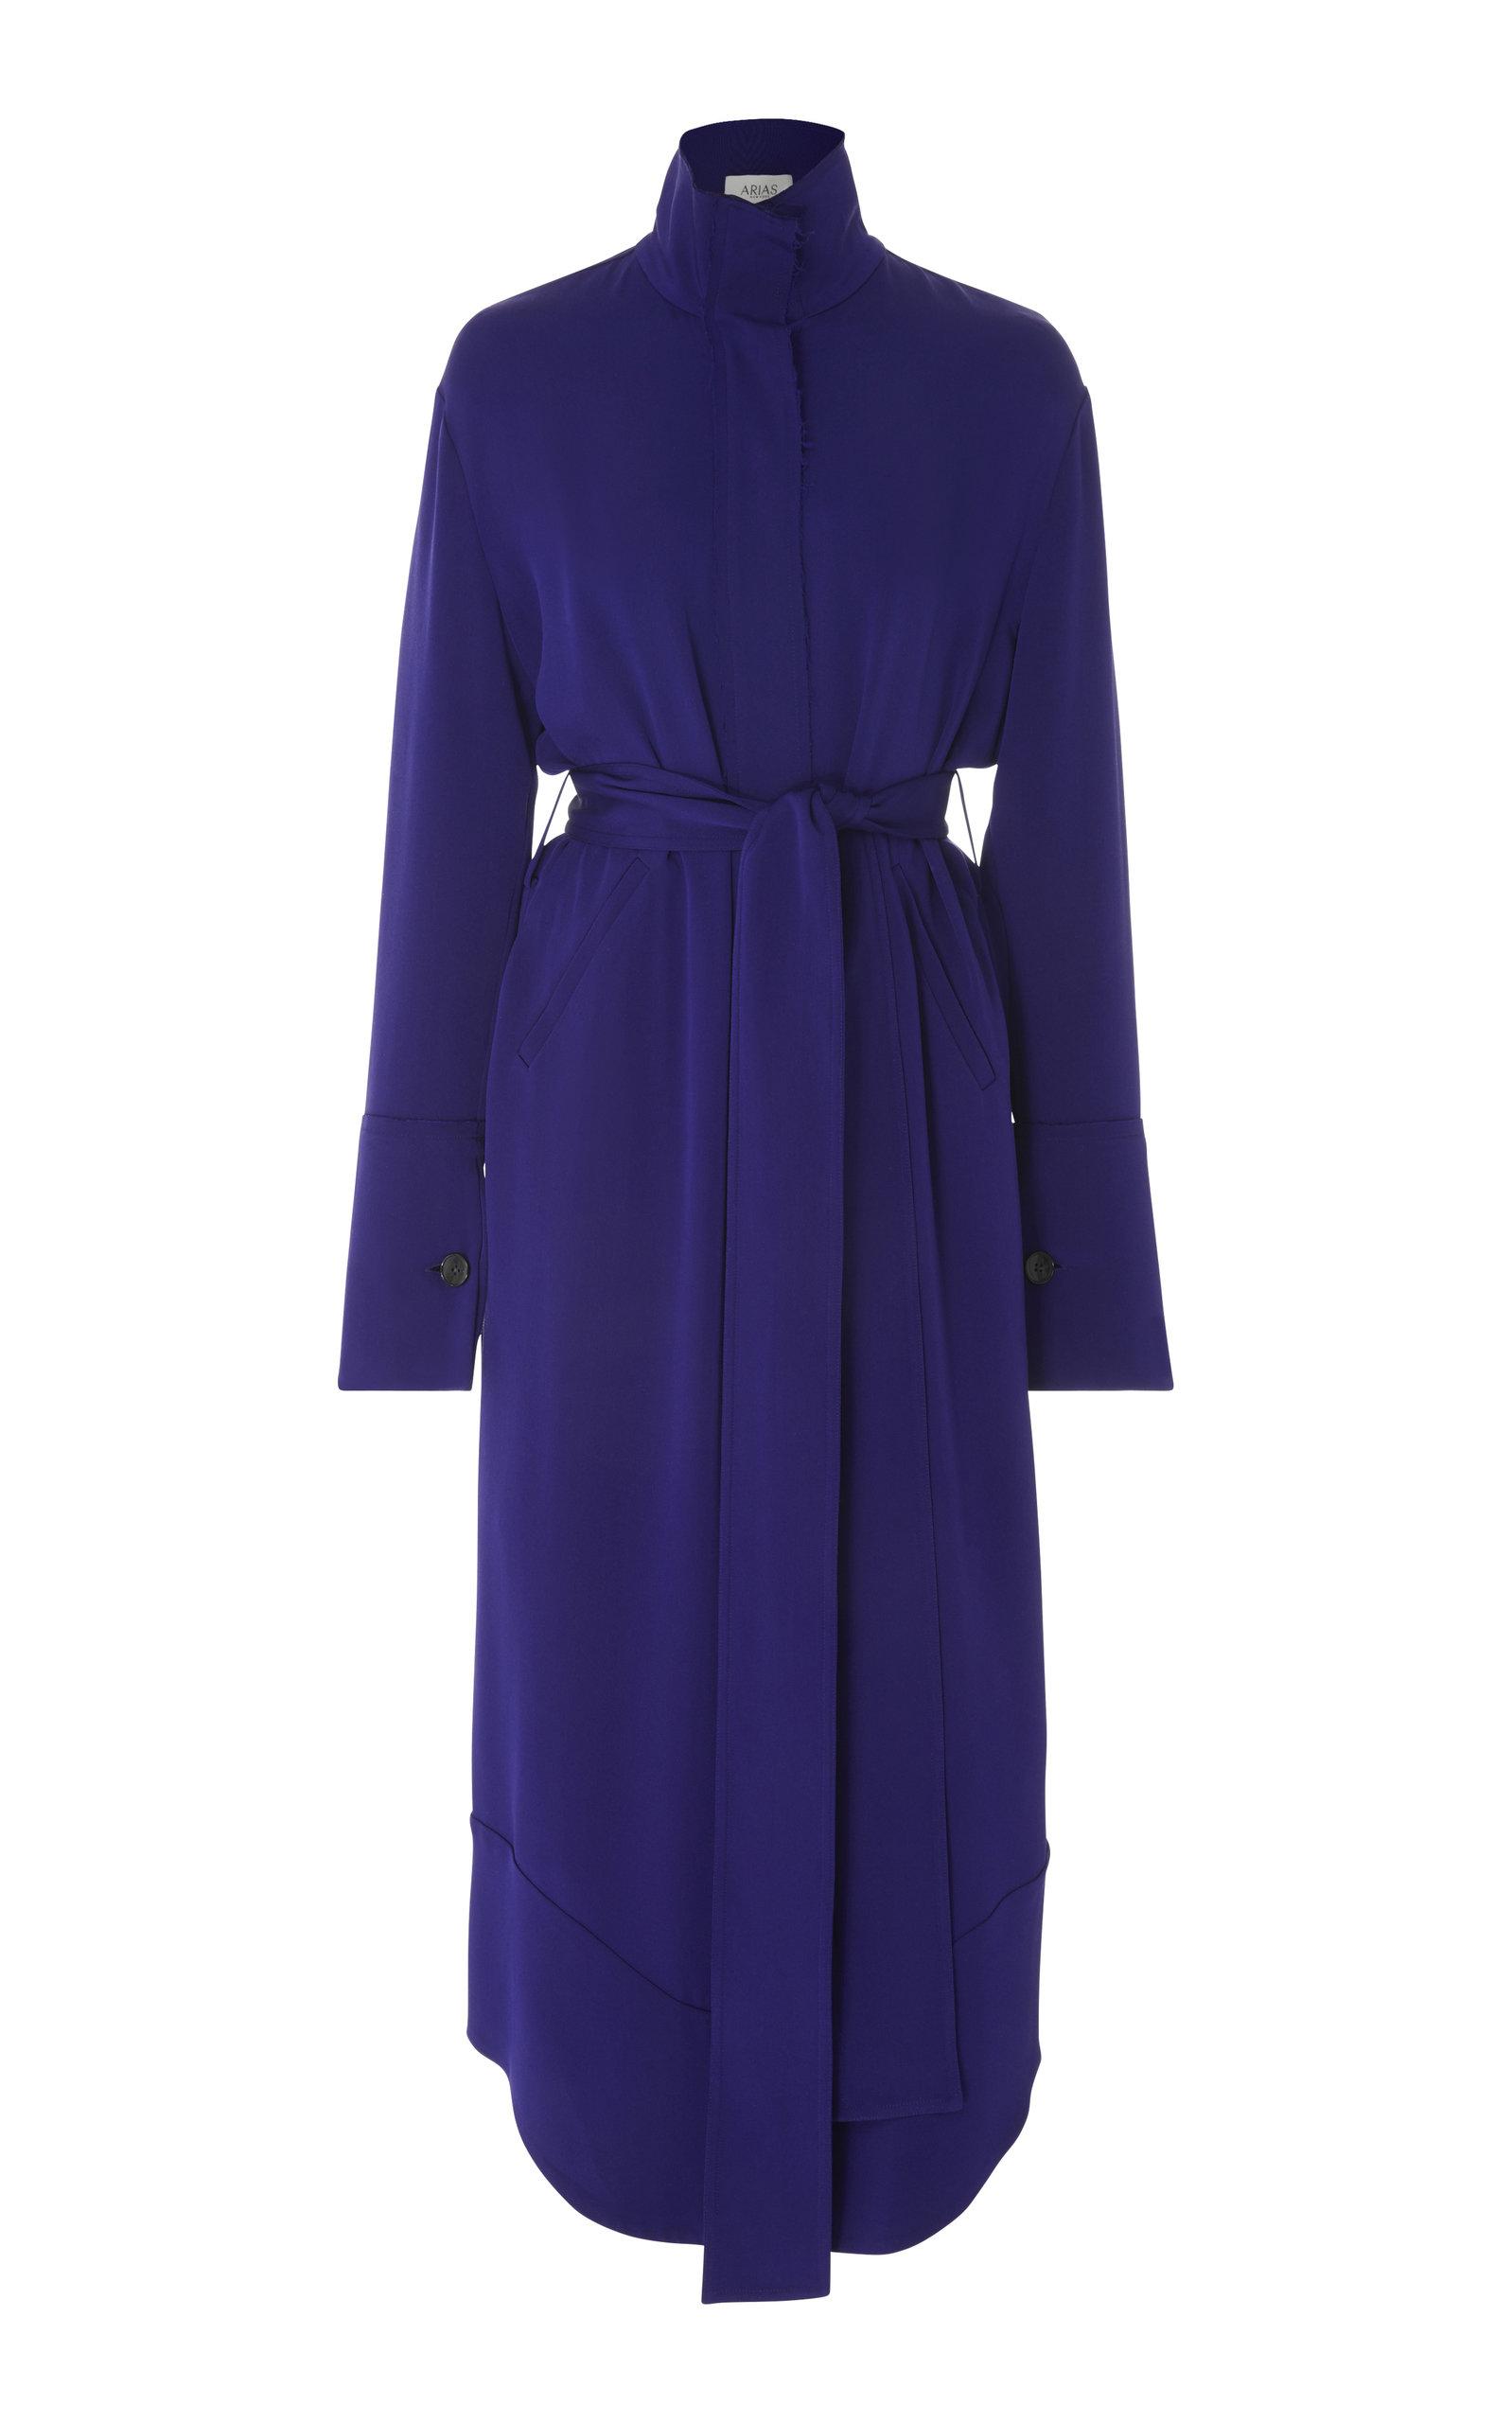 ARIAS SIGNATURE SILK SHIRT DRESS